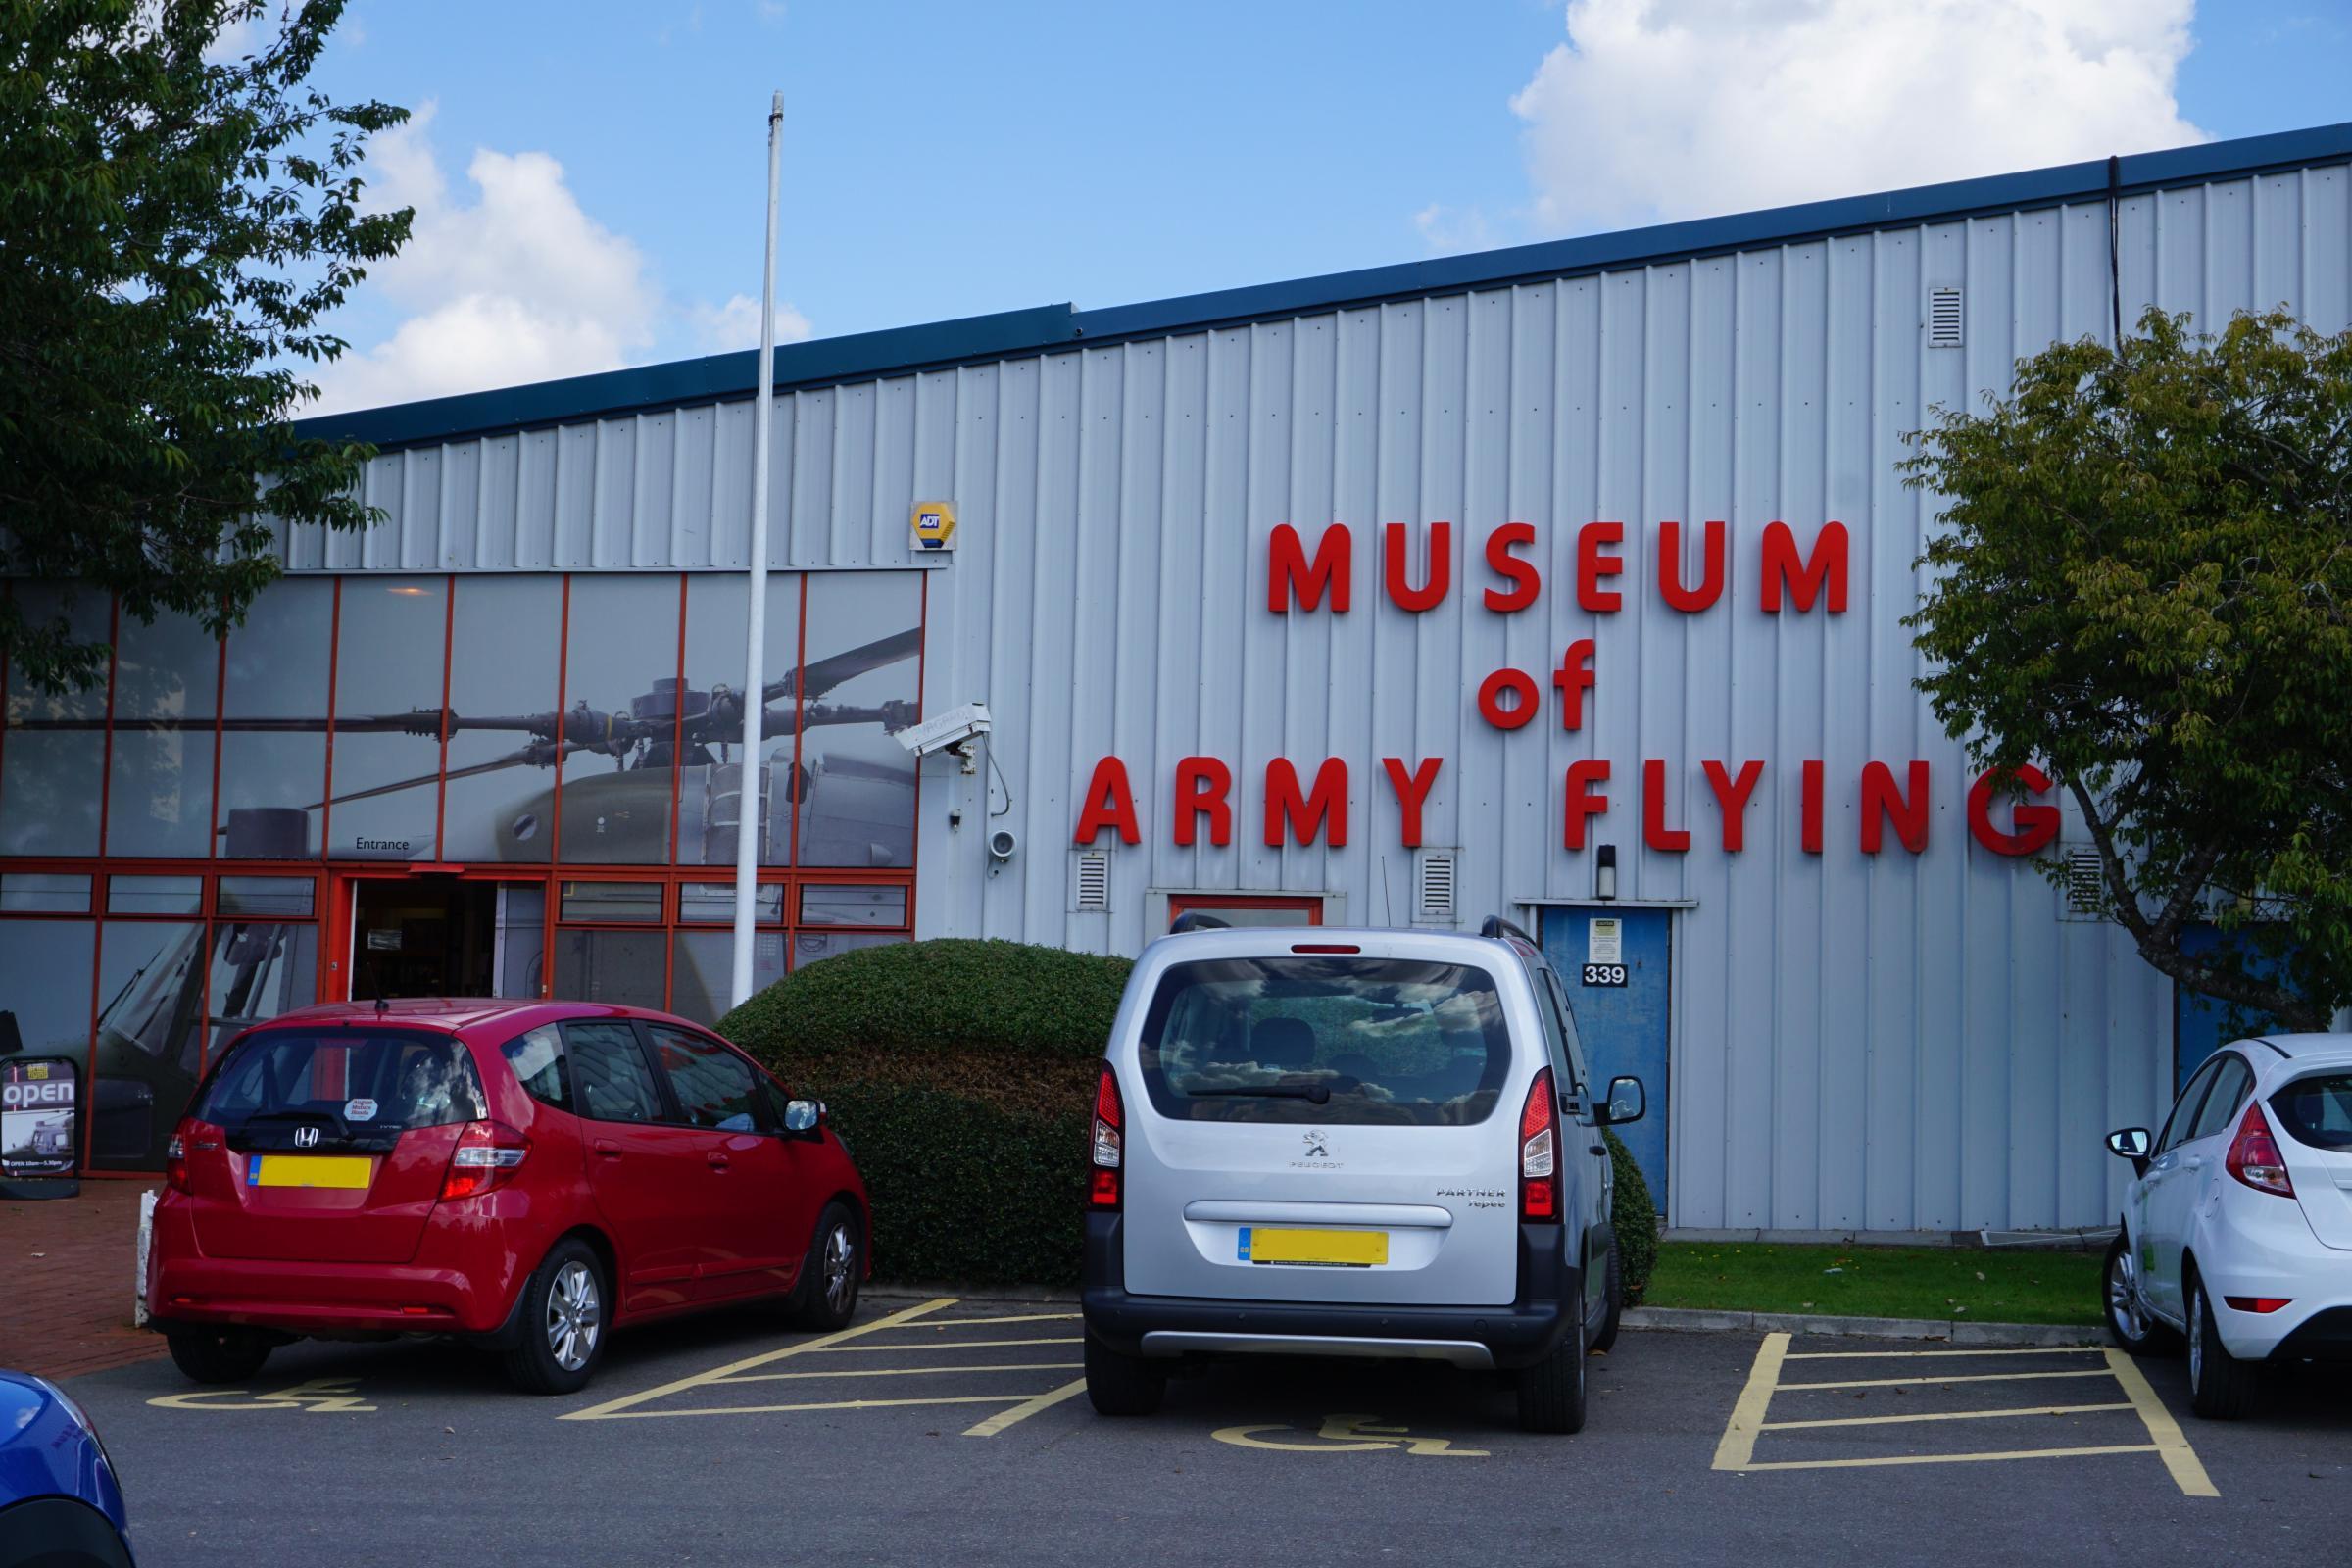 Museum shuts as £2.5m revamp starts